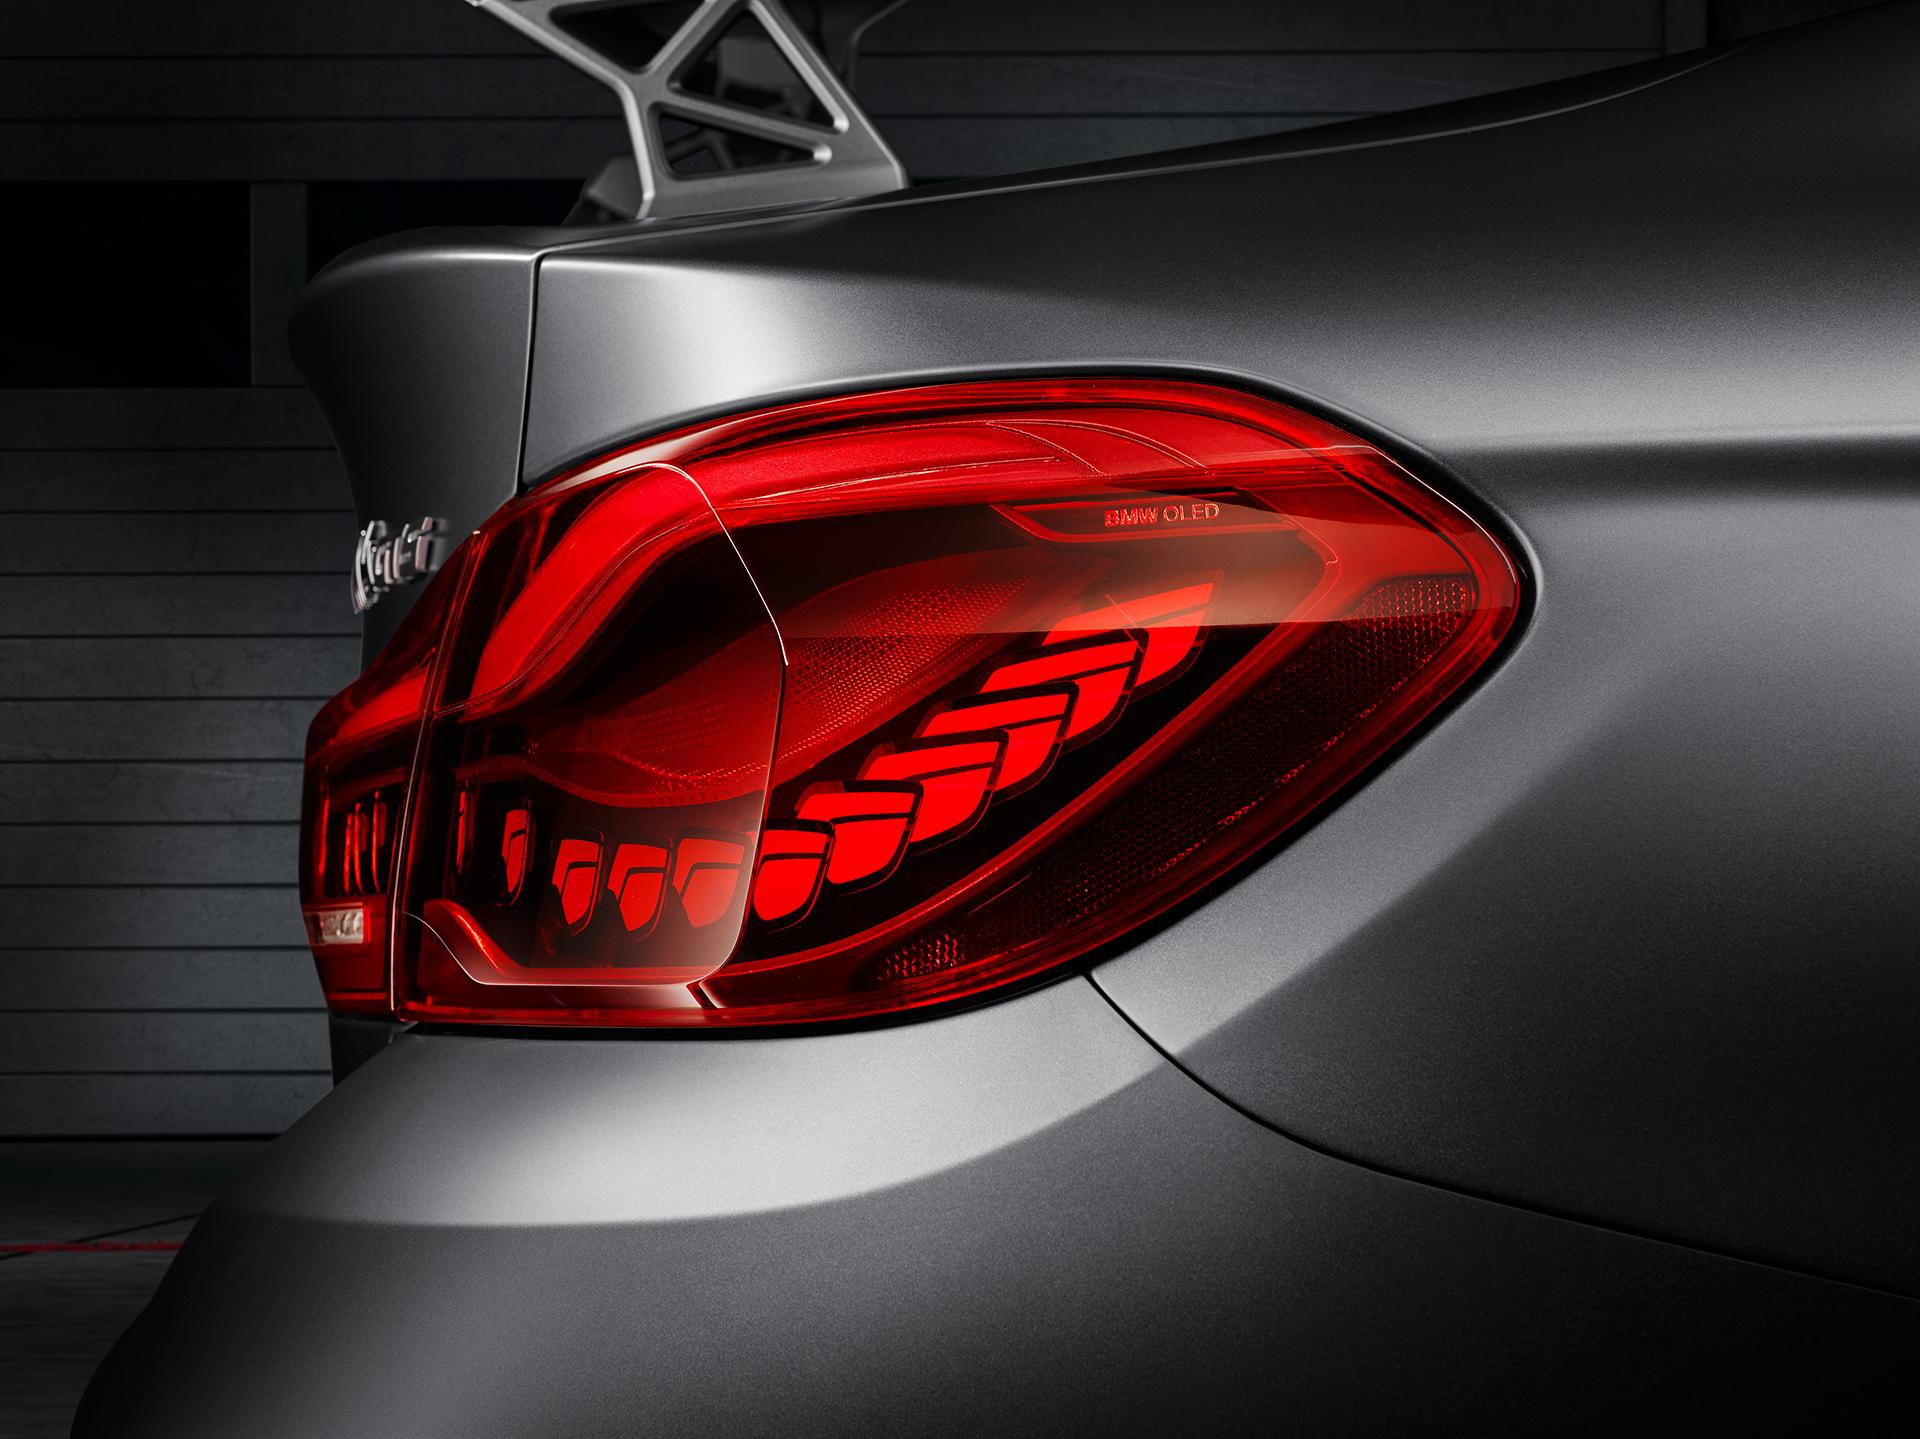 BMW M4 GTS - OLED arrière / rear OLED